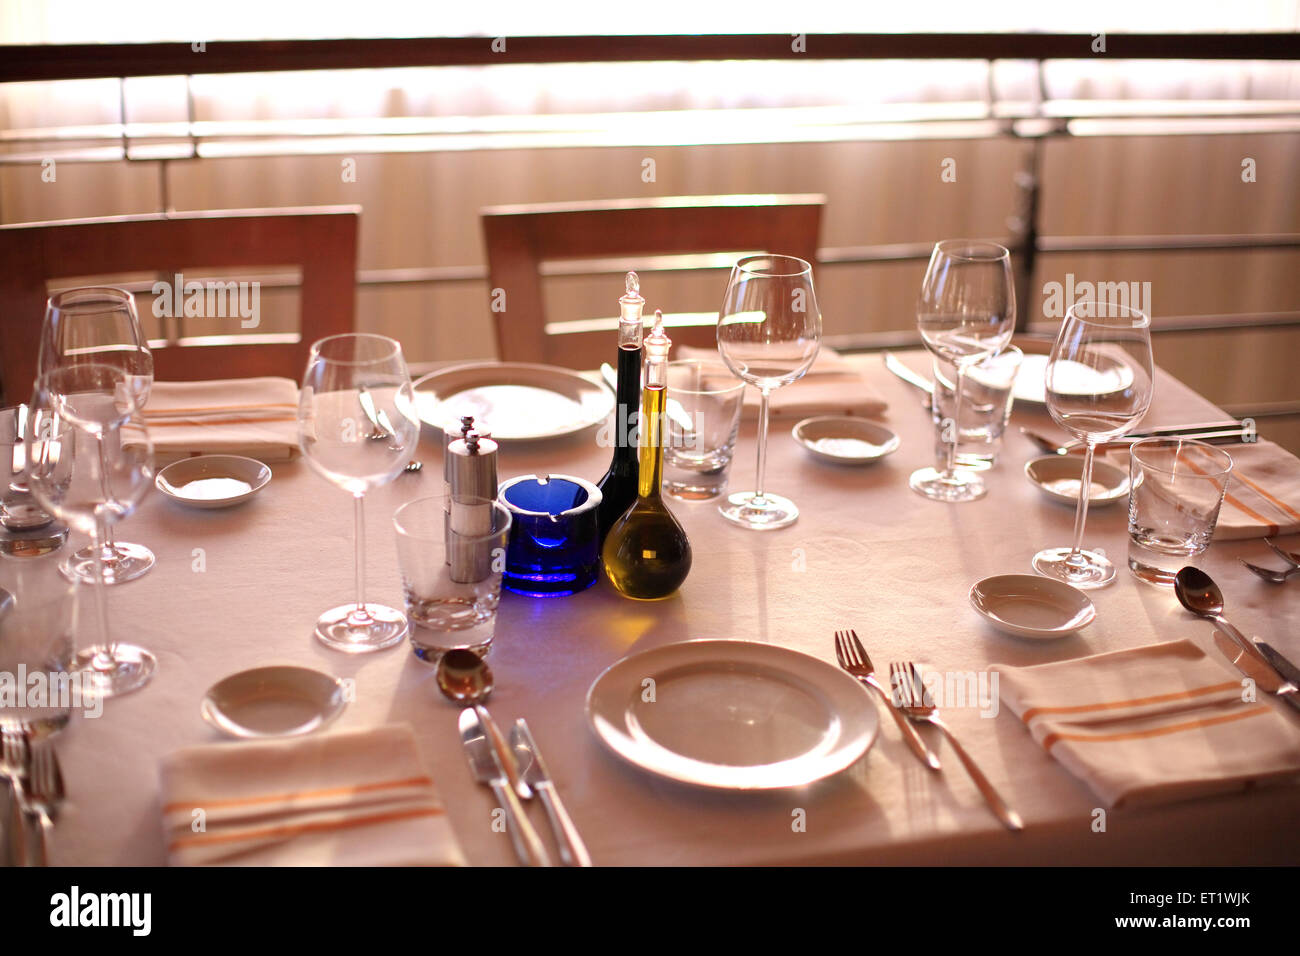 Table à manger dans l'hôtel, avec des couverts; Bombay Mumbai Maharashtra; Inde; Photo Stock